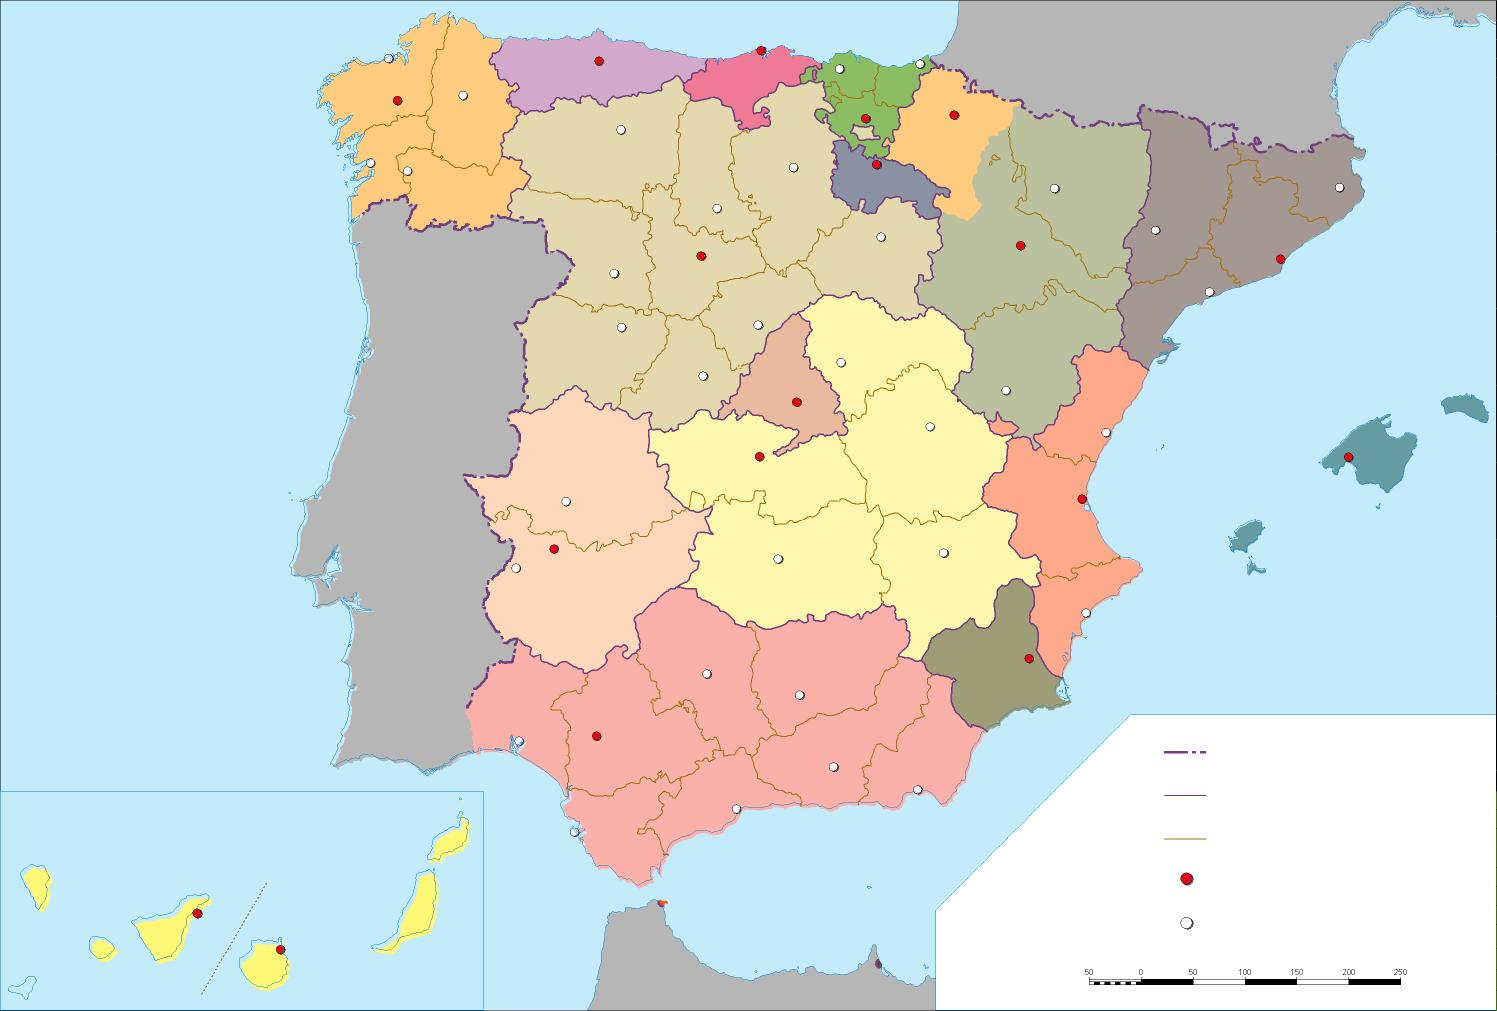 Mapa Mudo coloreado de las Comunidades Autónomas de España